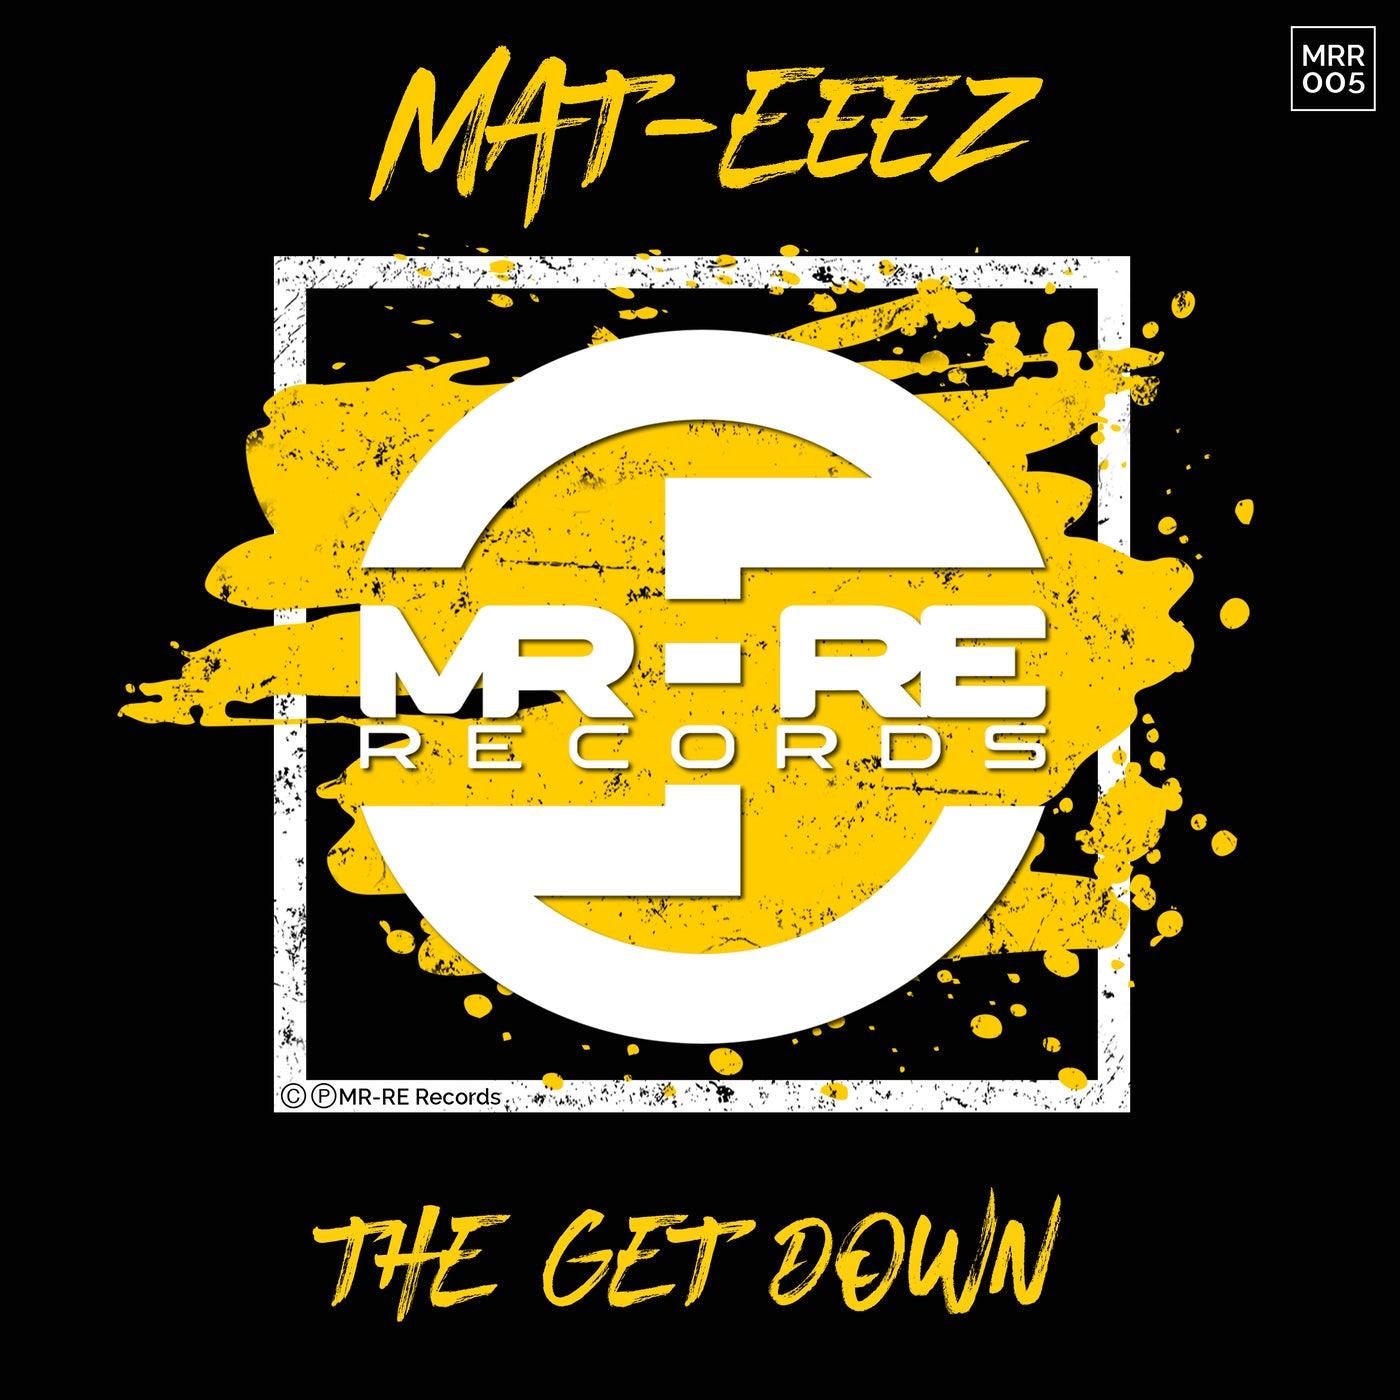 The Get Down (Original Mix)